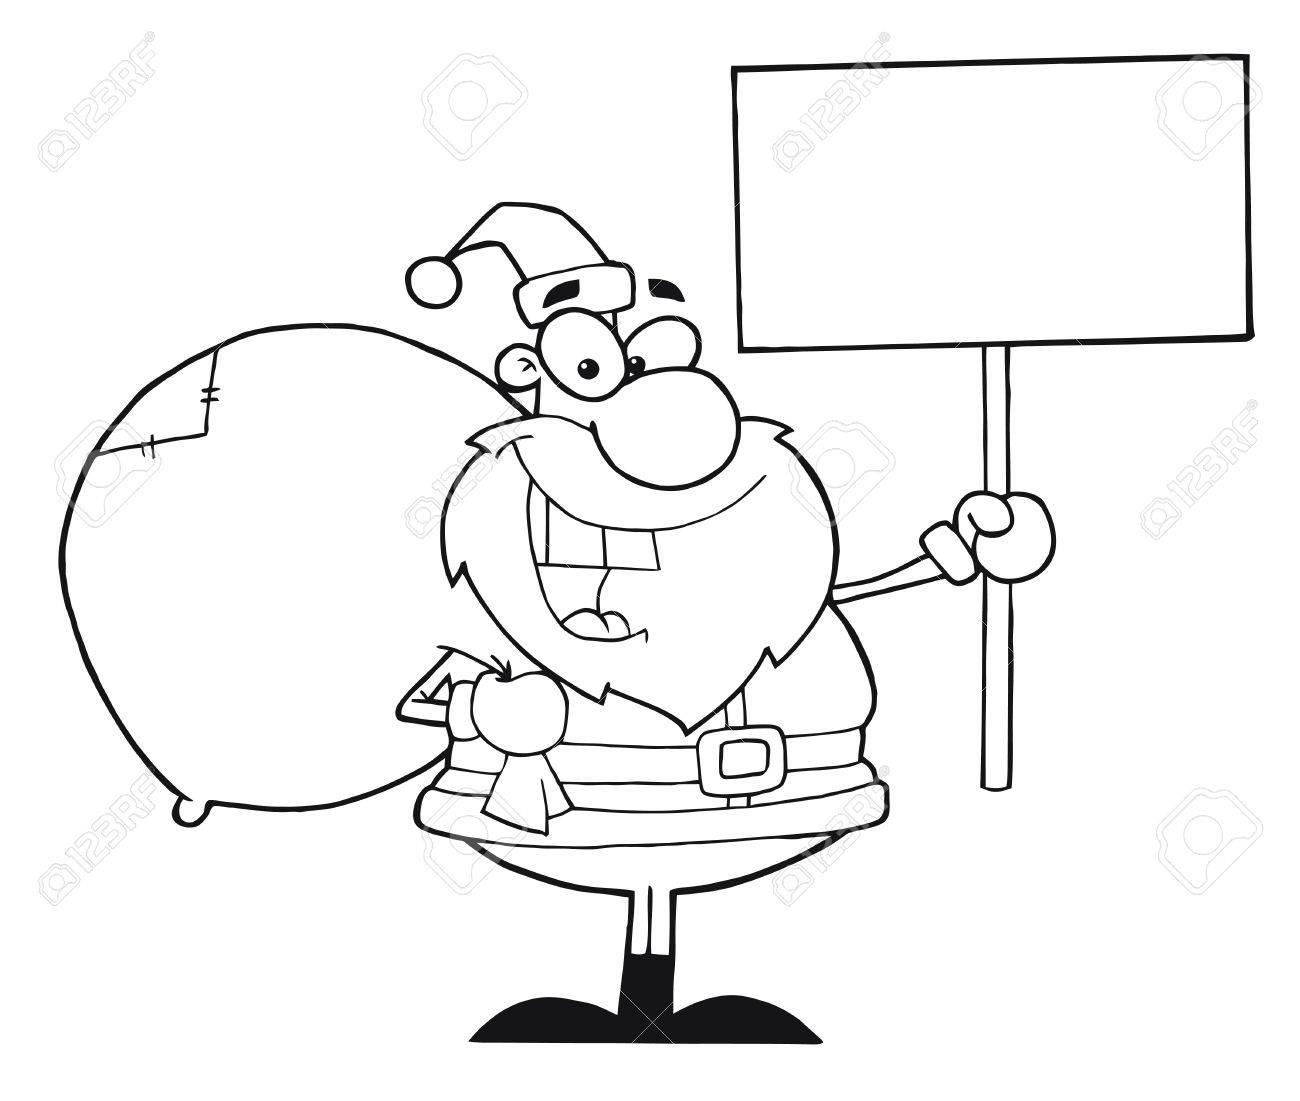 Outline Christmas Santa Holding A Blank Sign Stock Vector - 8284468